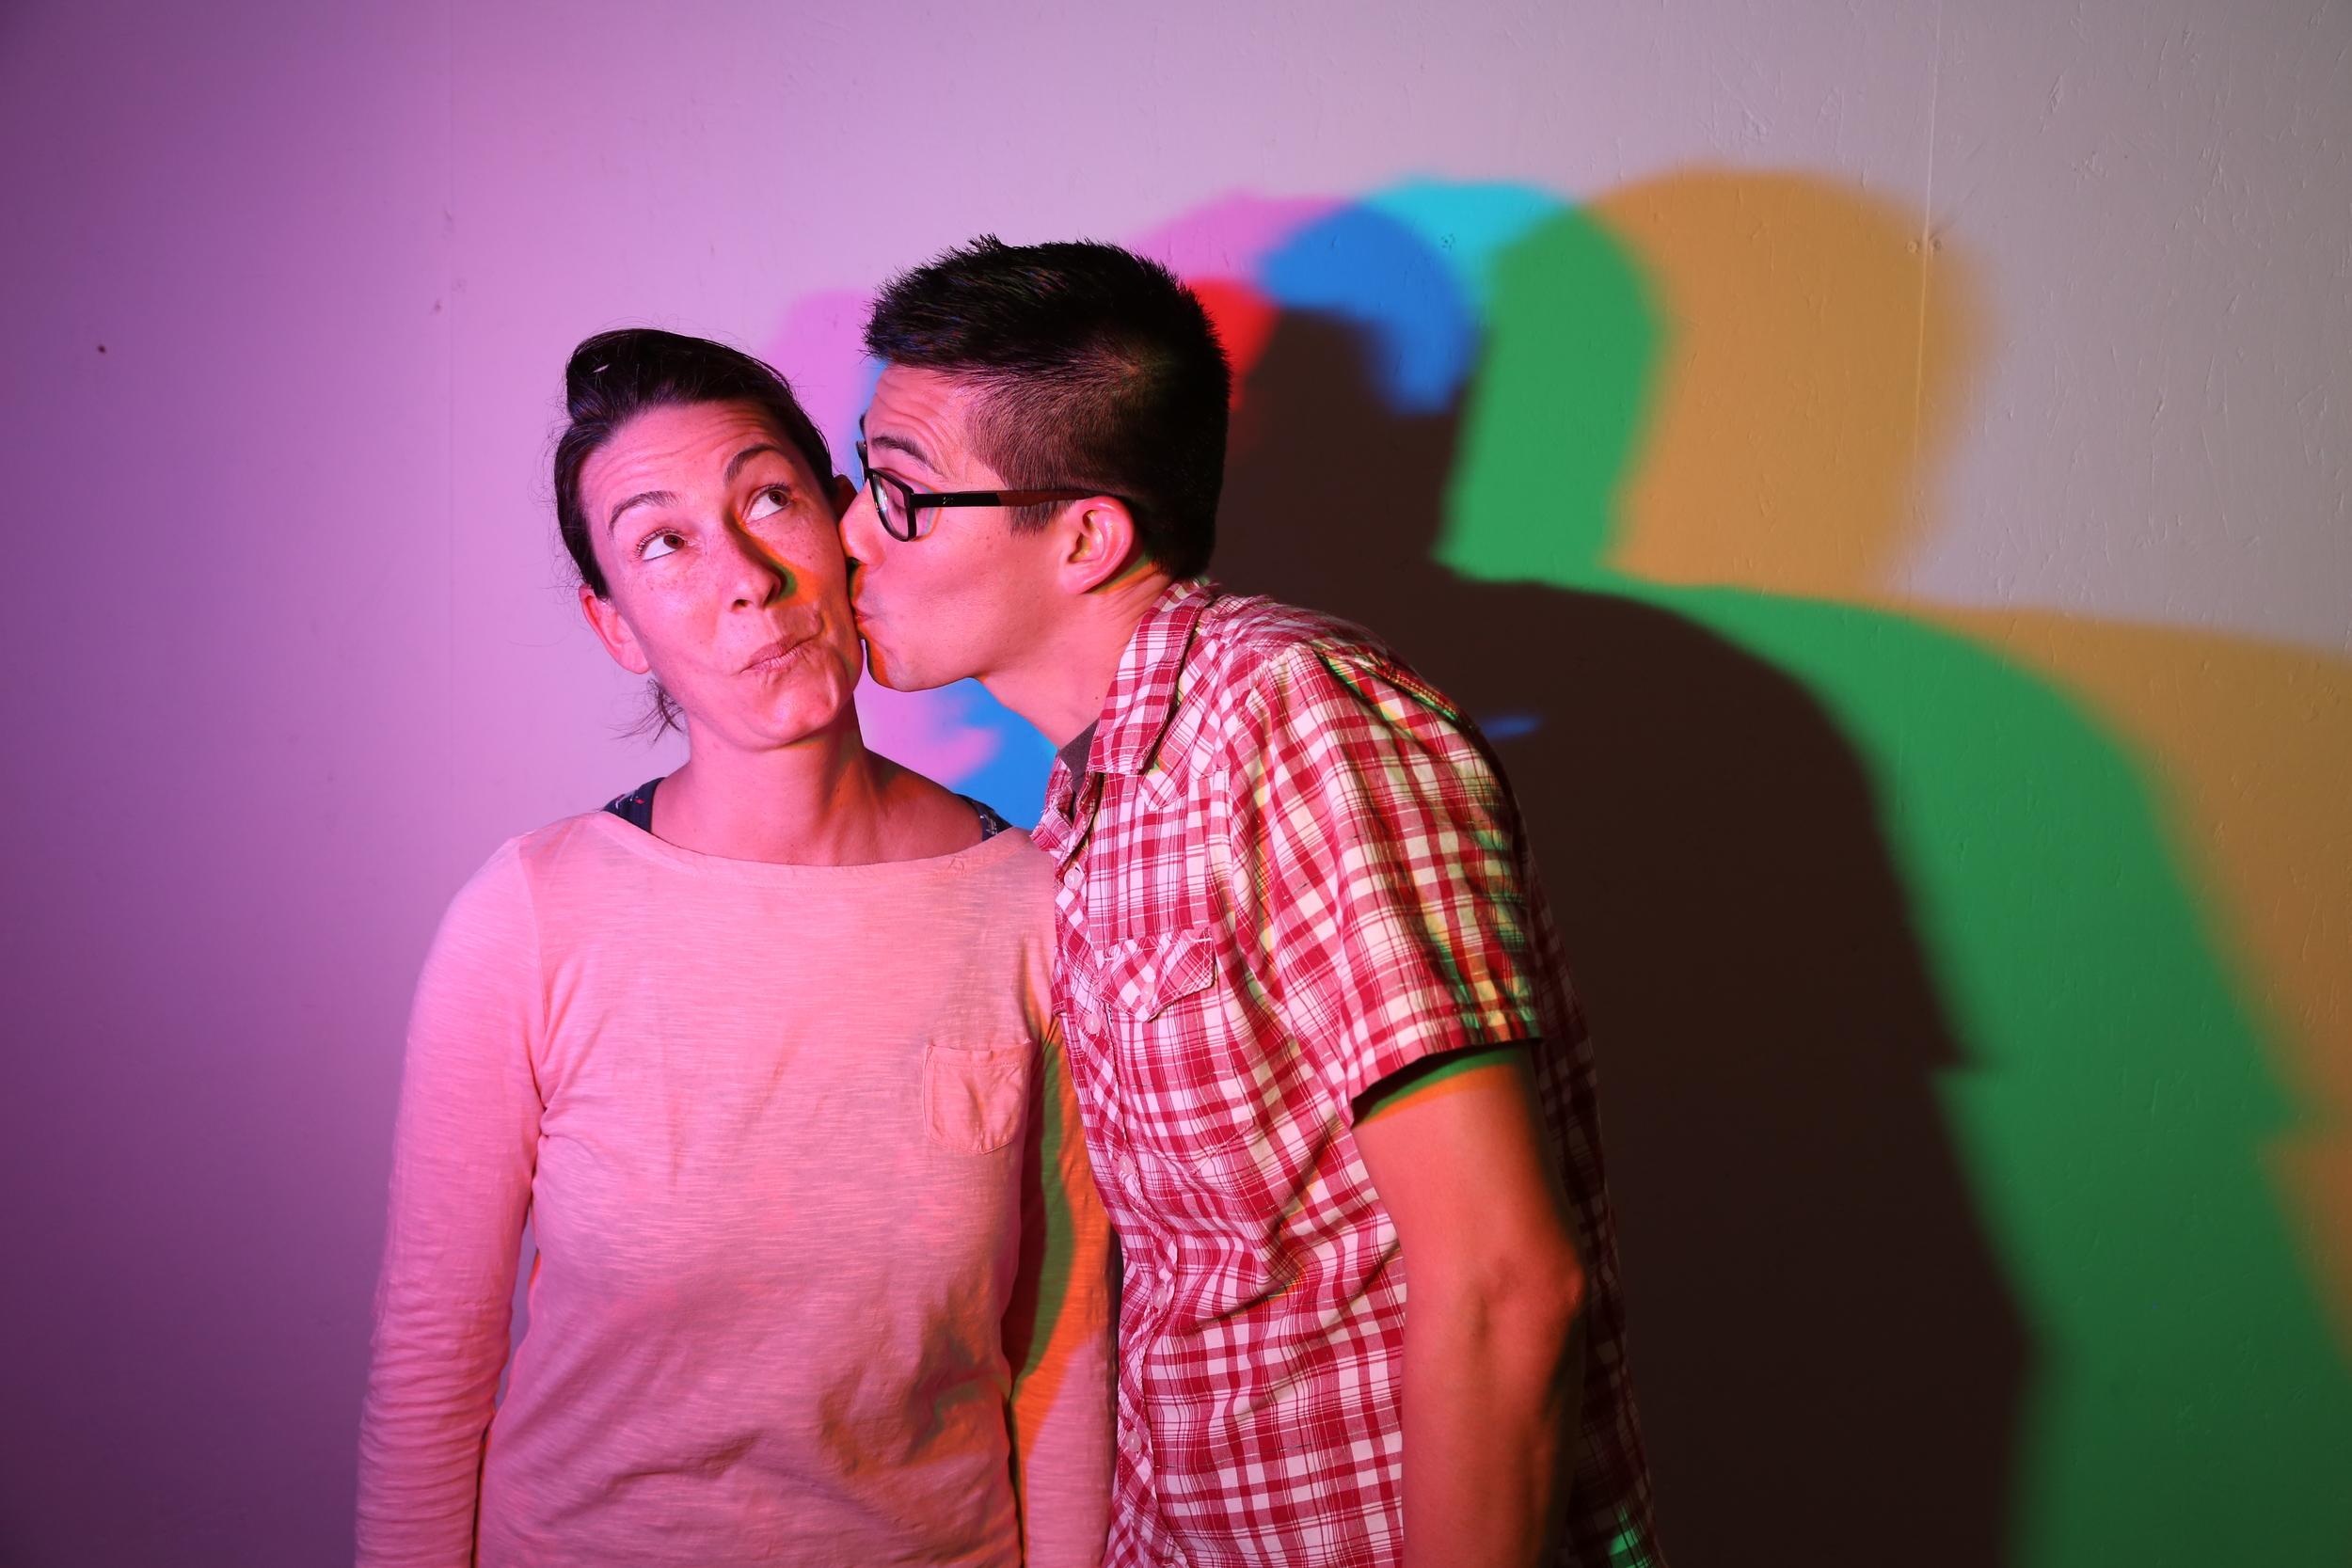 Technicolor-Photo-Jeremy-Pair-204.JPG